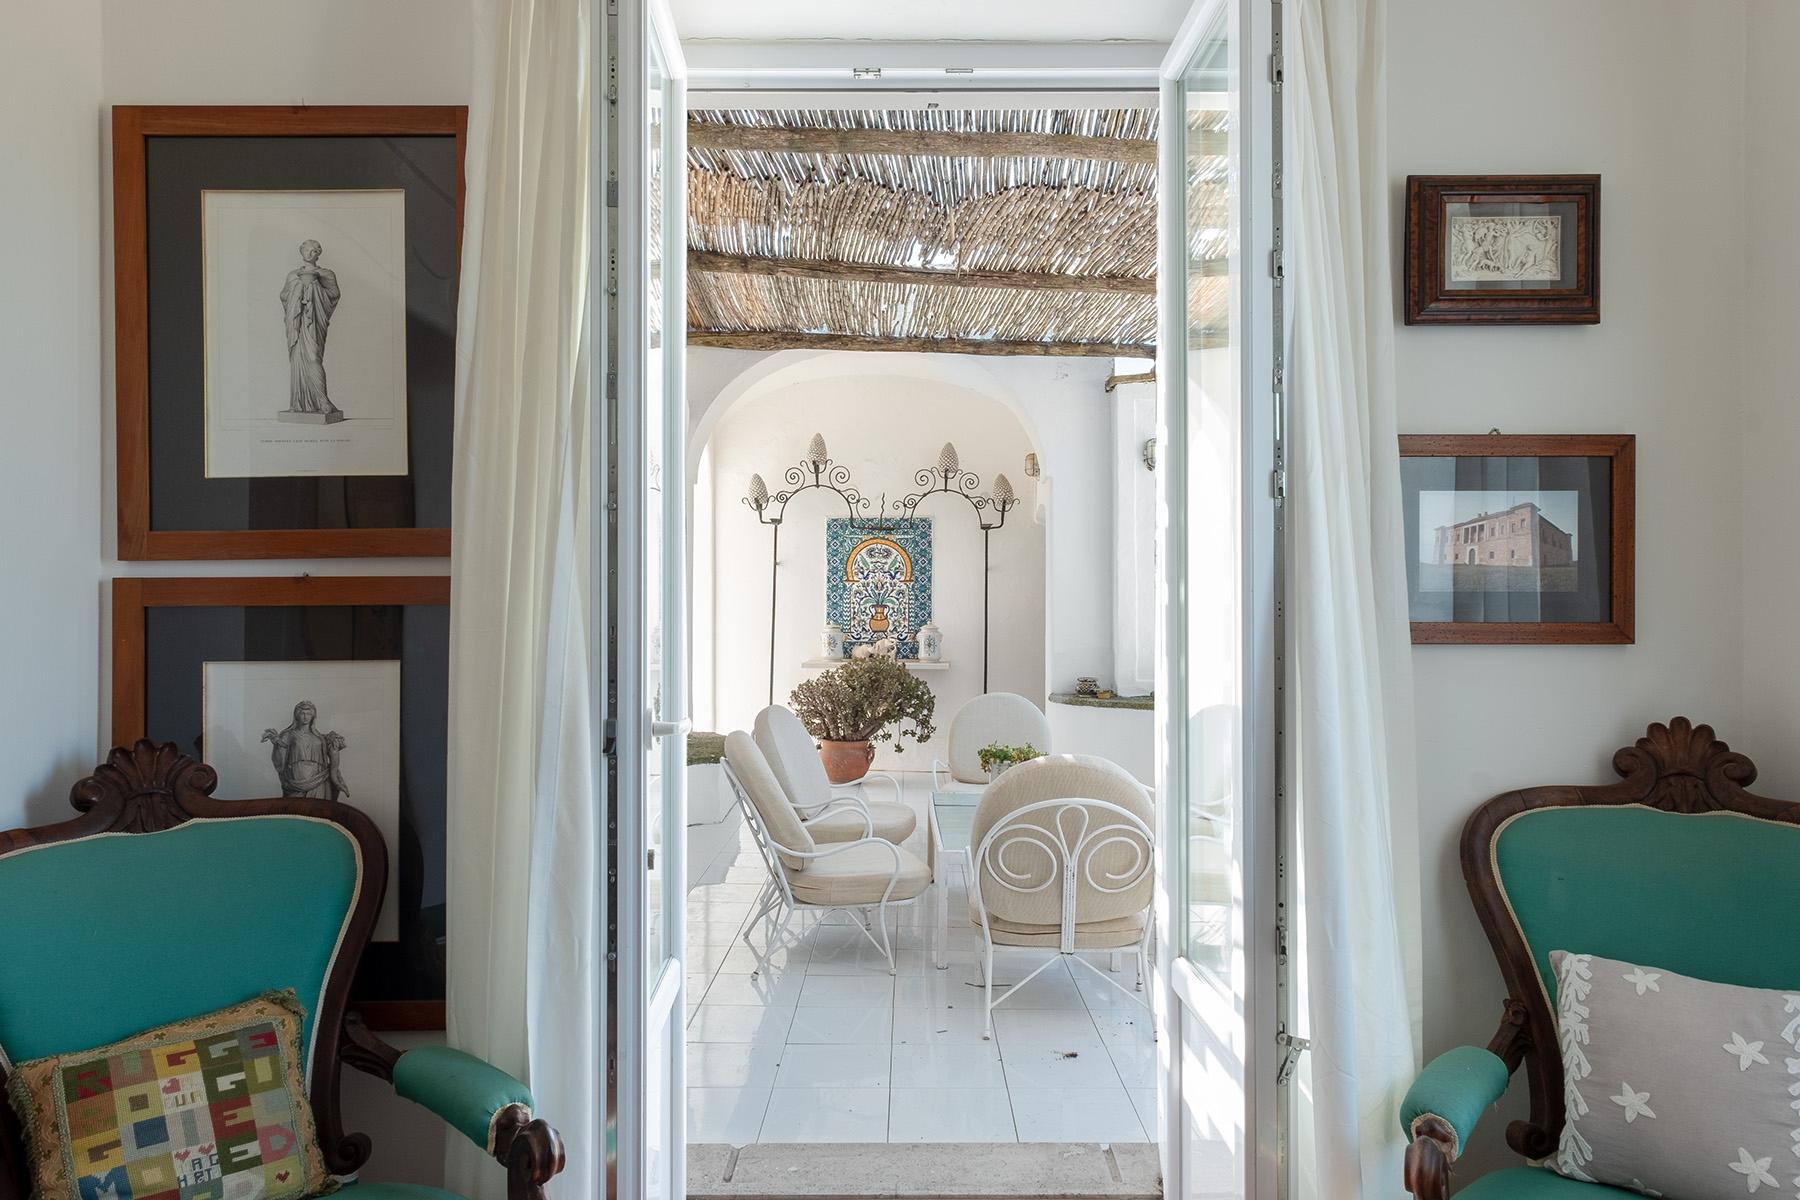 Casa indipendente in Vendita a Capri: 5 locali, 300 mq - Foto 11